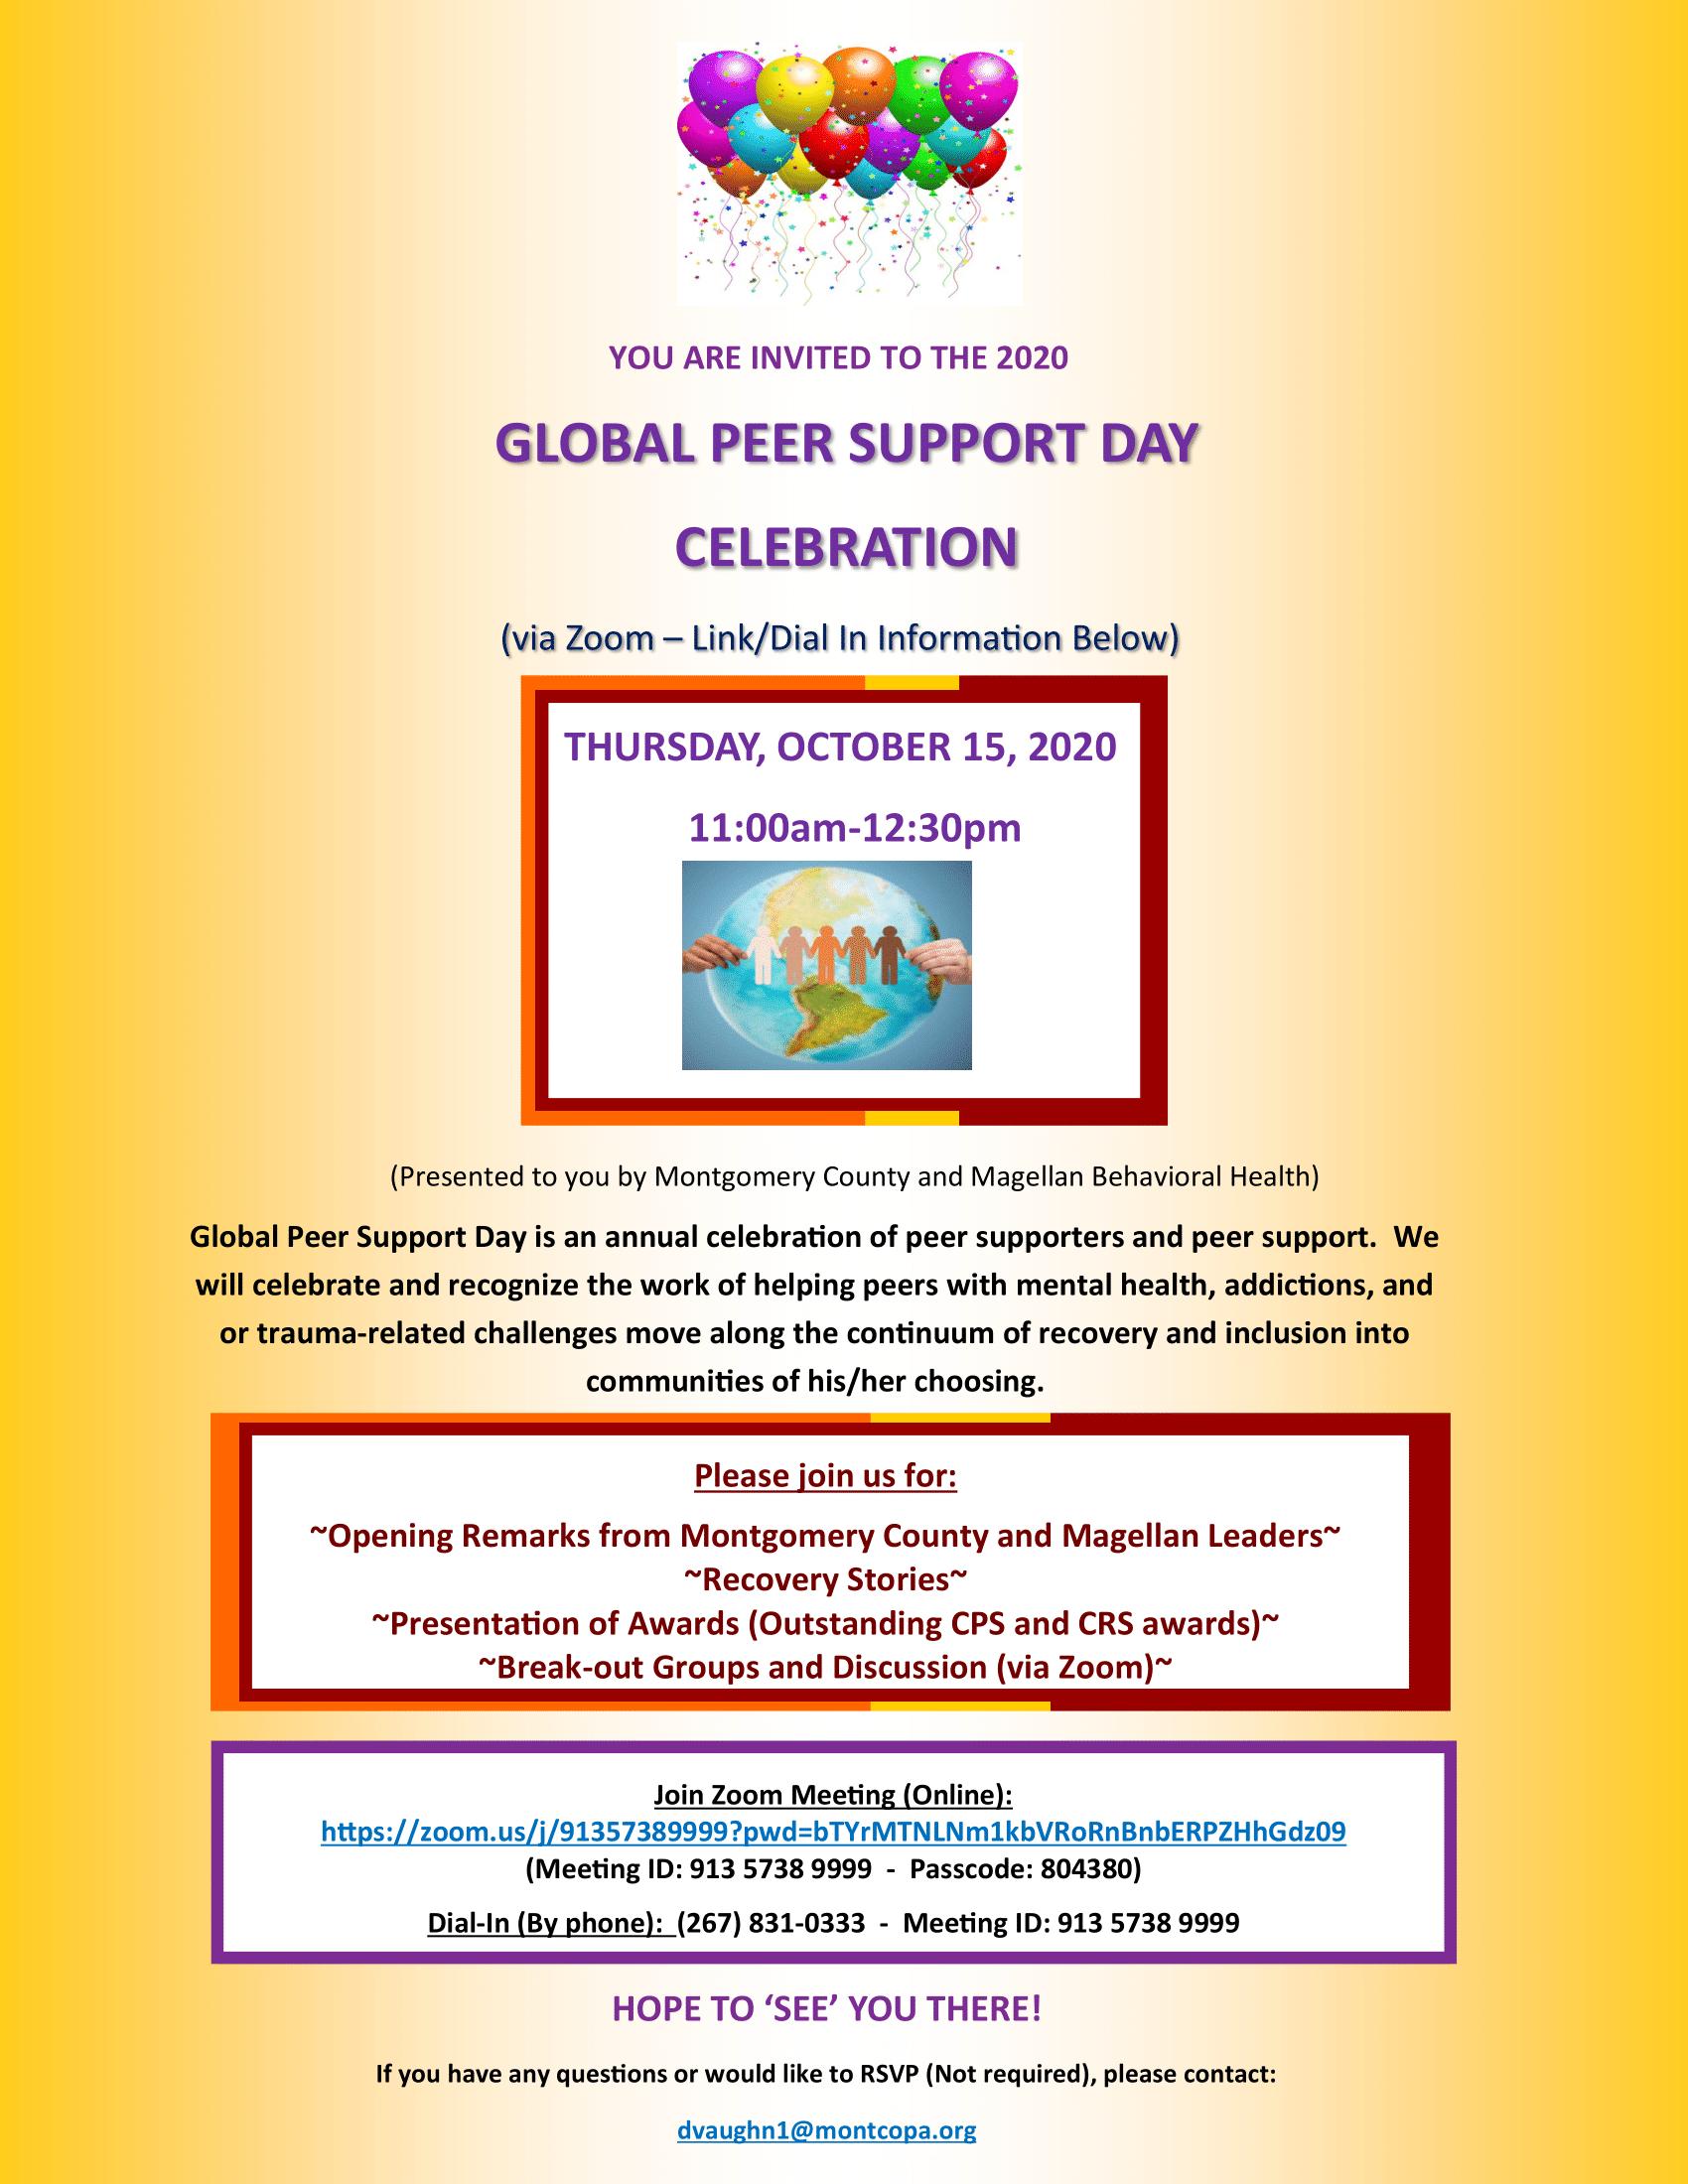 2020 Global Peer Support Day Celebration